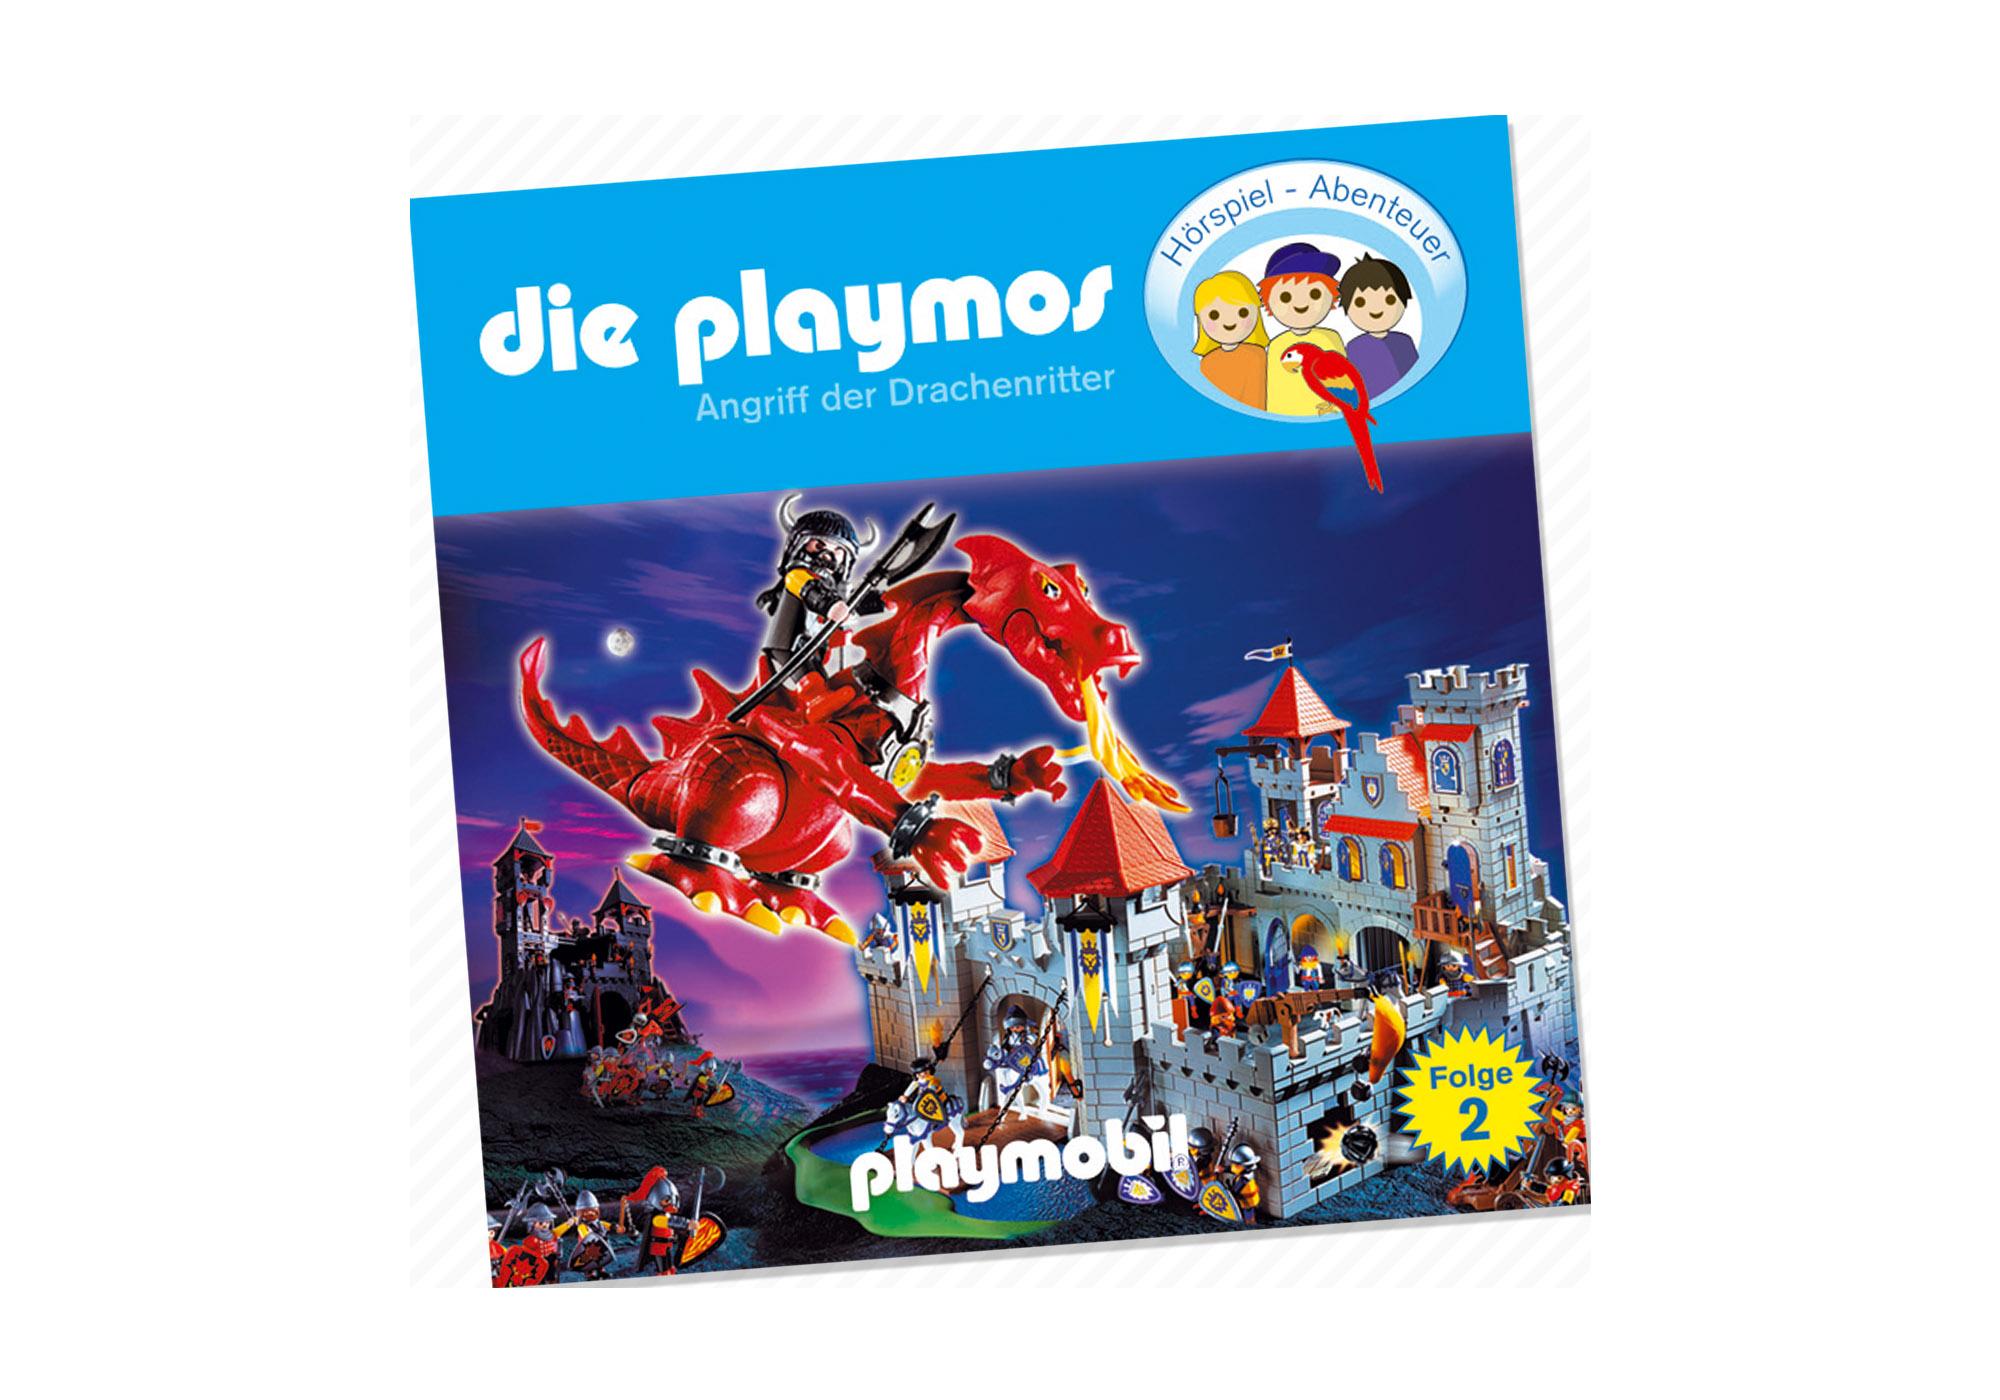 http://media.playmobil.com/i/playmobil/80130_product_detail/Angriff der Drachenritter (2) - CD